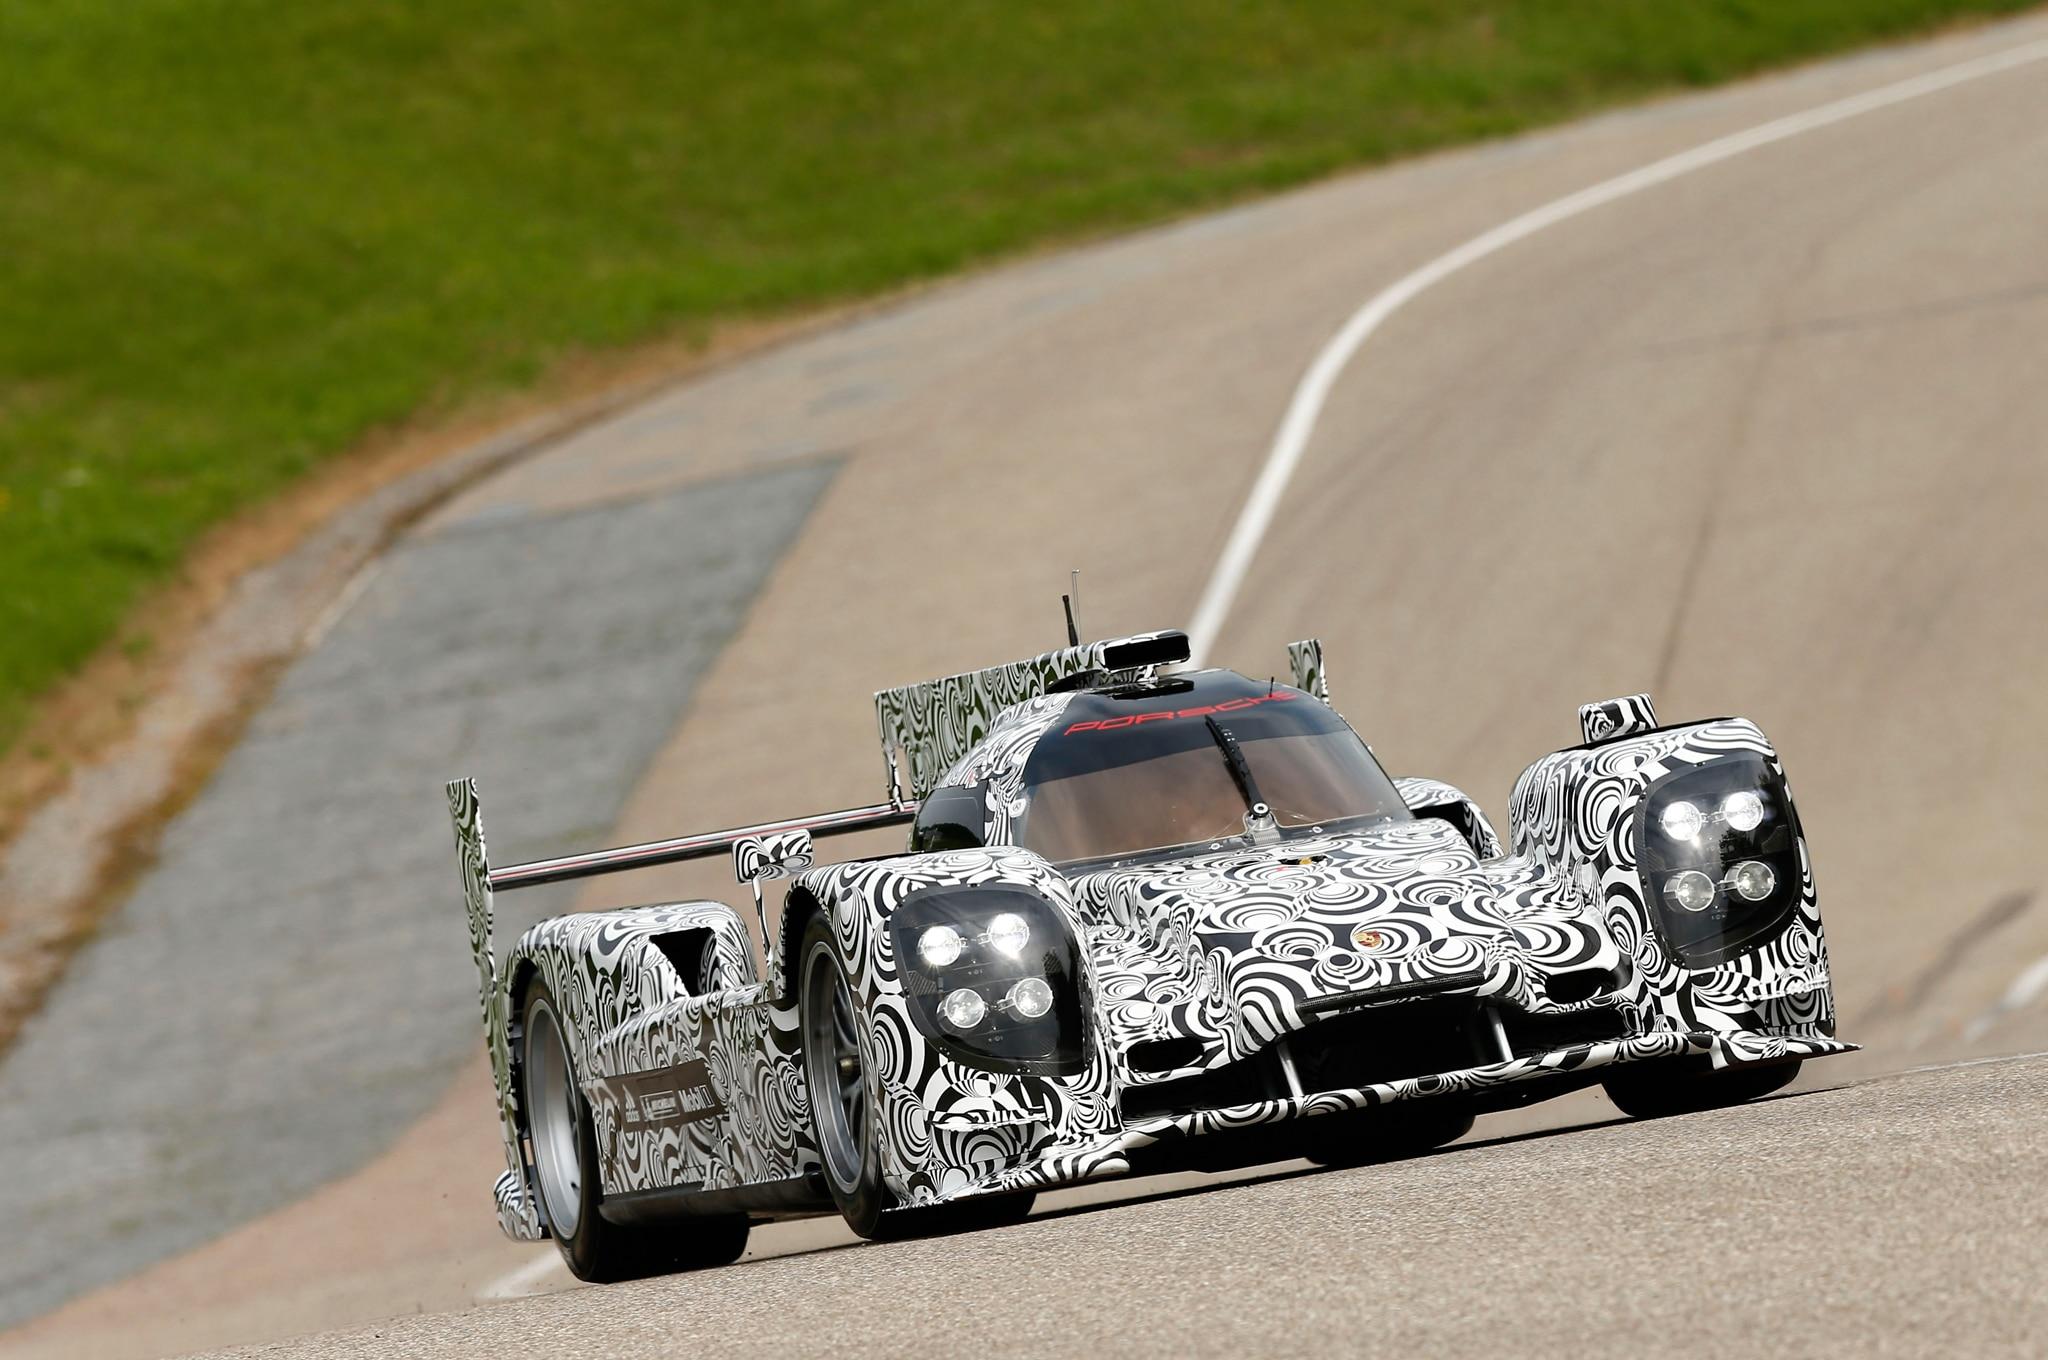 2014 Porsche LMP1 Prototype 51